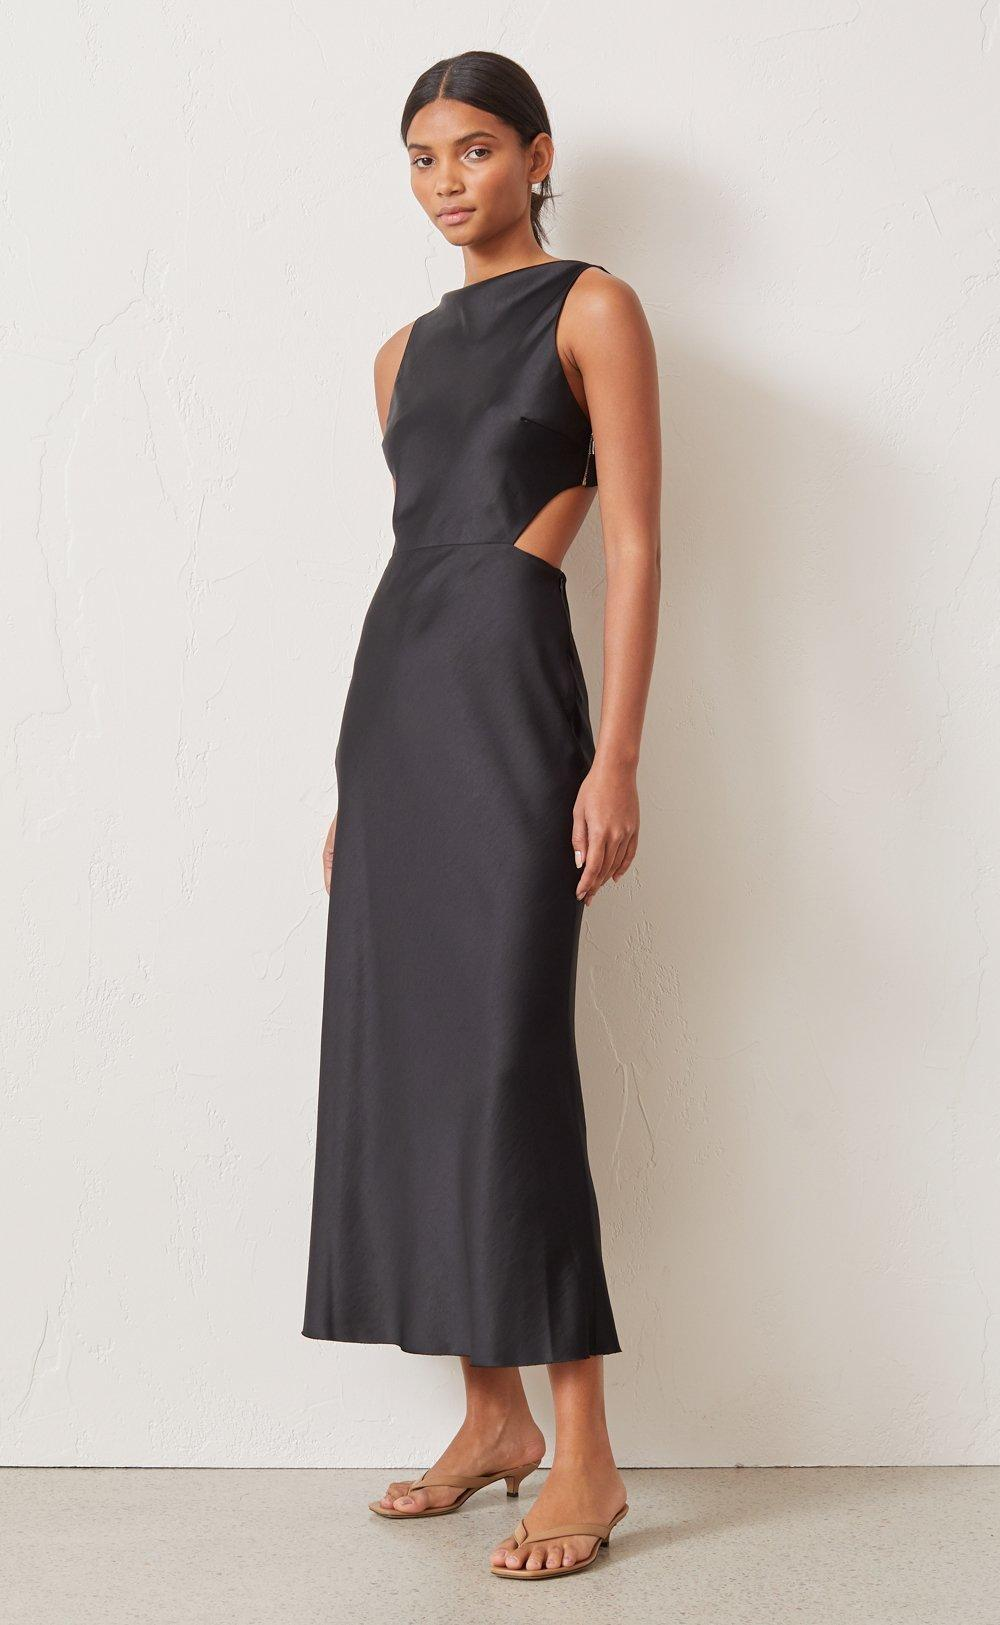 Bec & Bridge Seraphine Cut Out Midi Dress black size 6